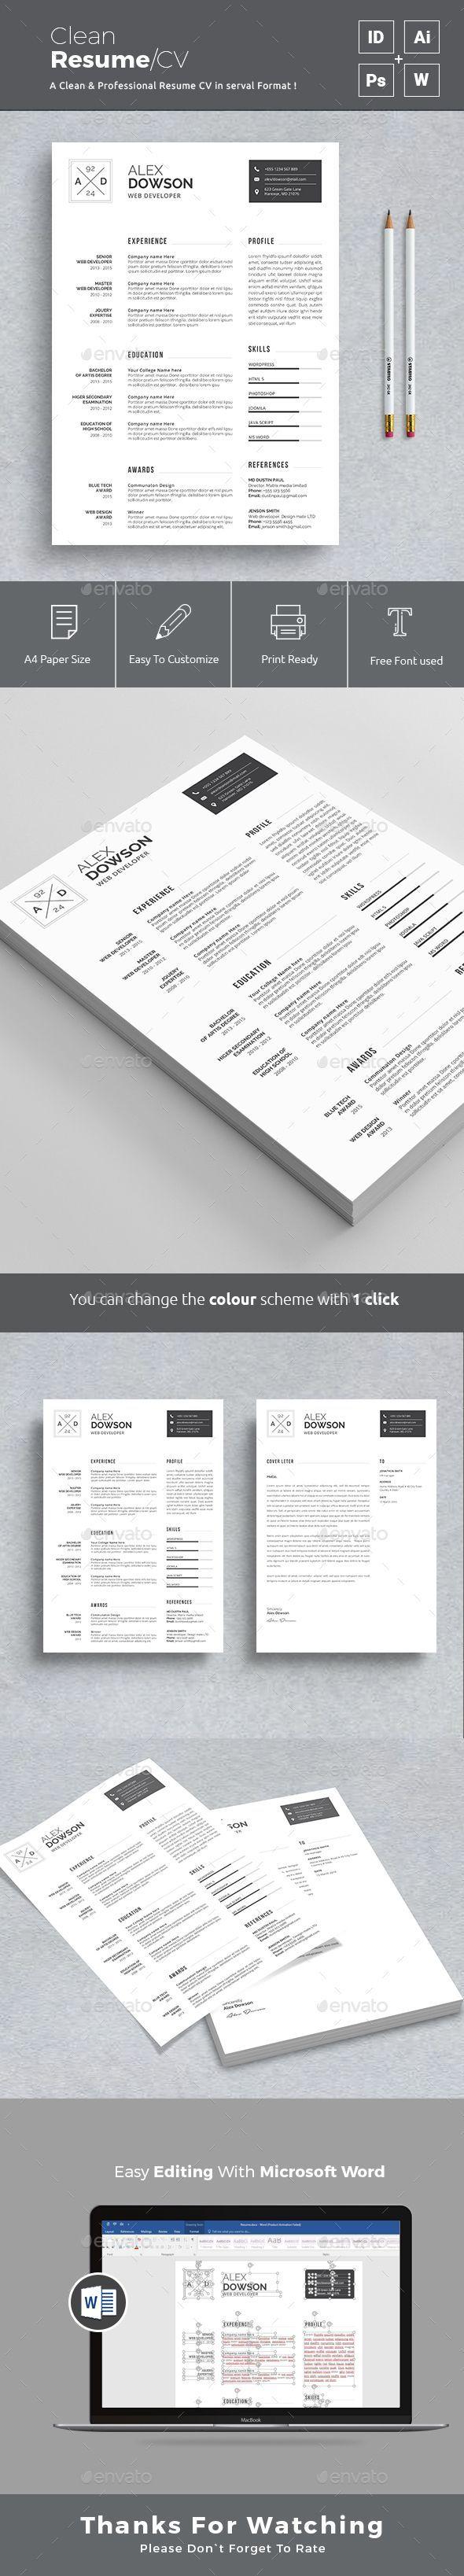 Simple Minimalist Resume Design Template - Resumes Stationery Design ...